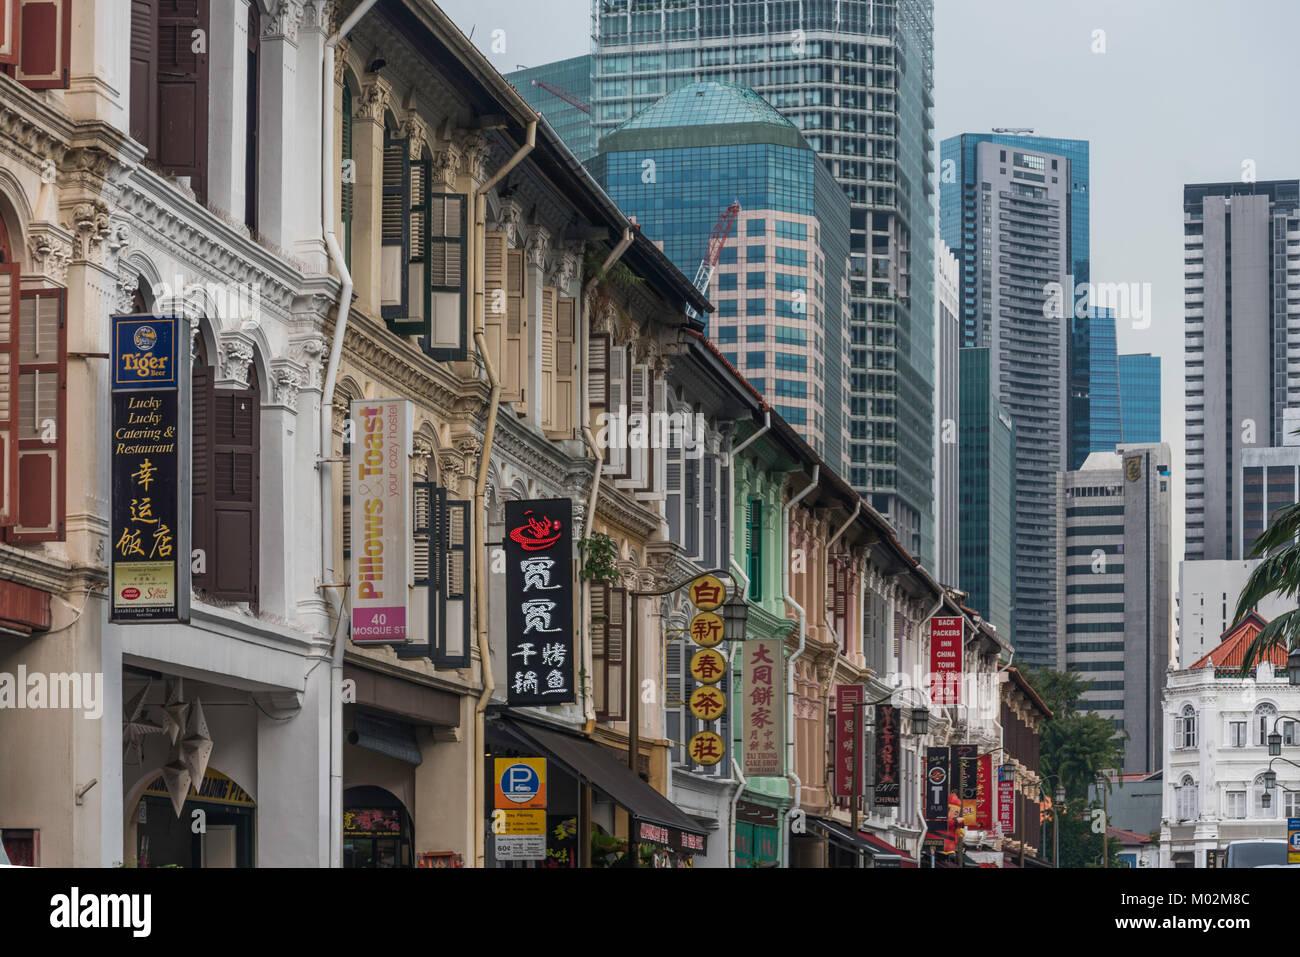 Mosque Street, Chinatown, Singapore Stock Photo